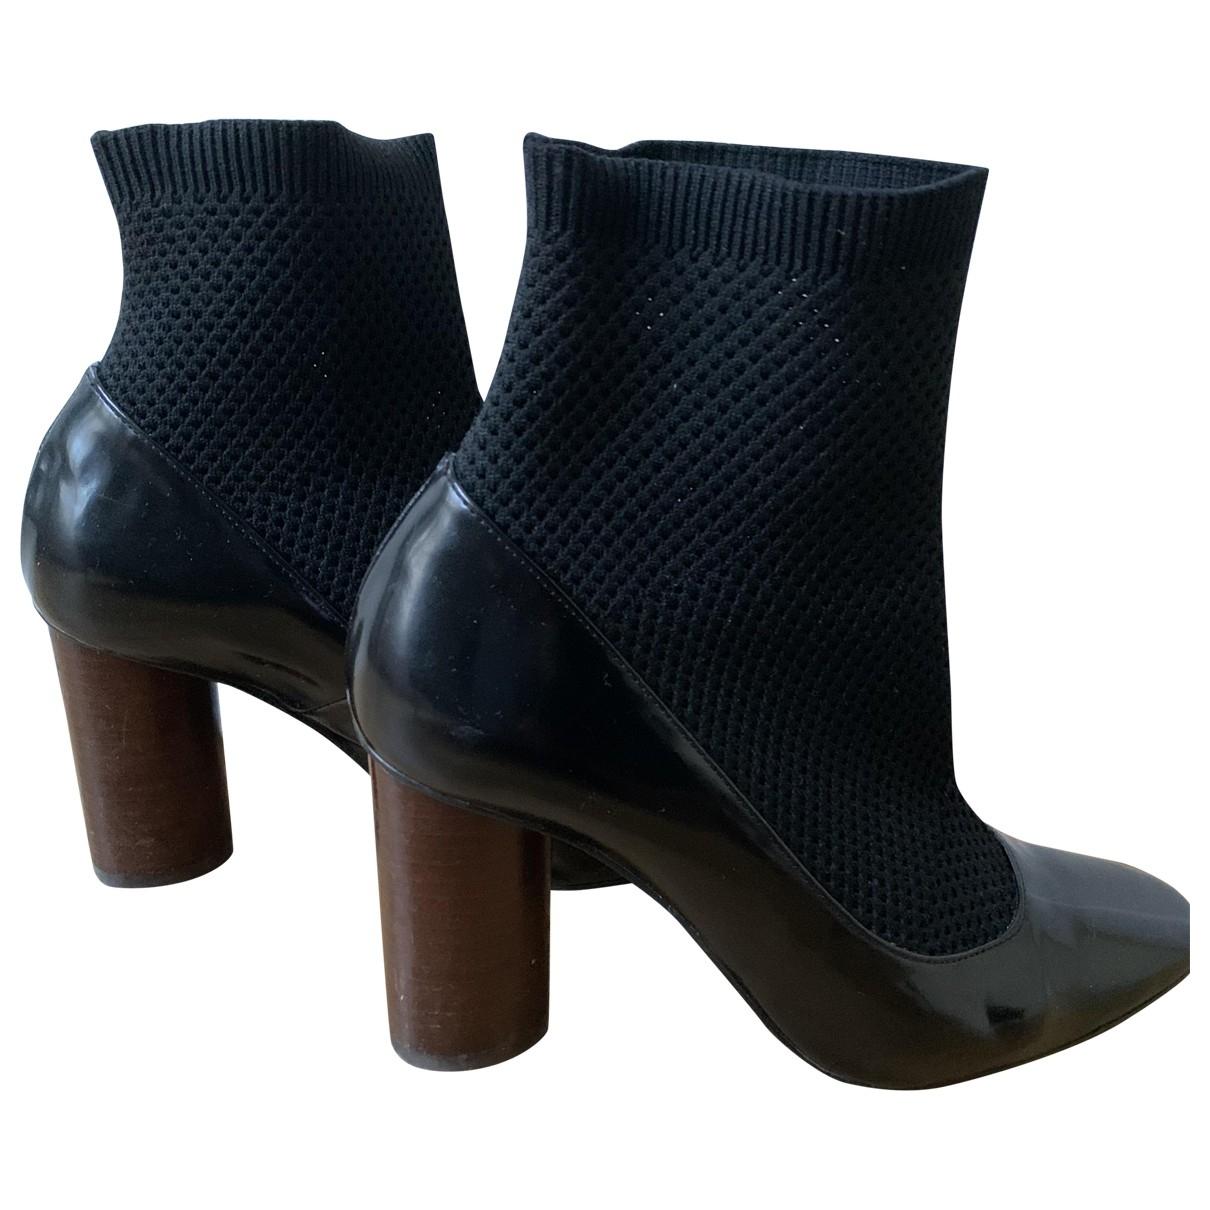 Claudie Pierlot \N Black Leather Ankle boots for Women 37 EU